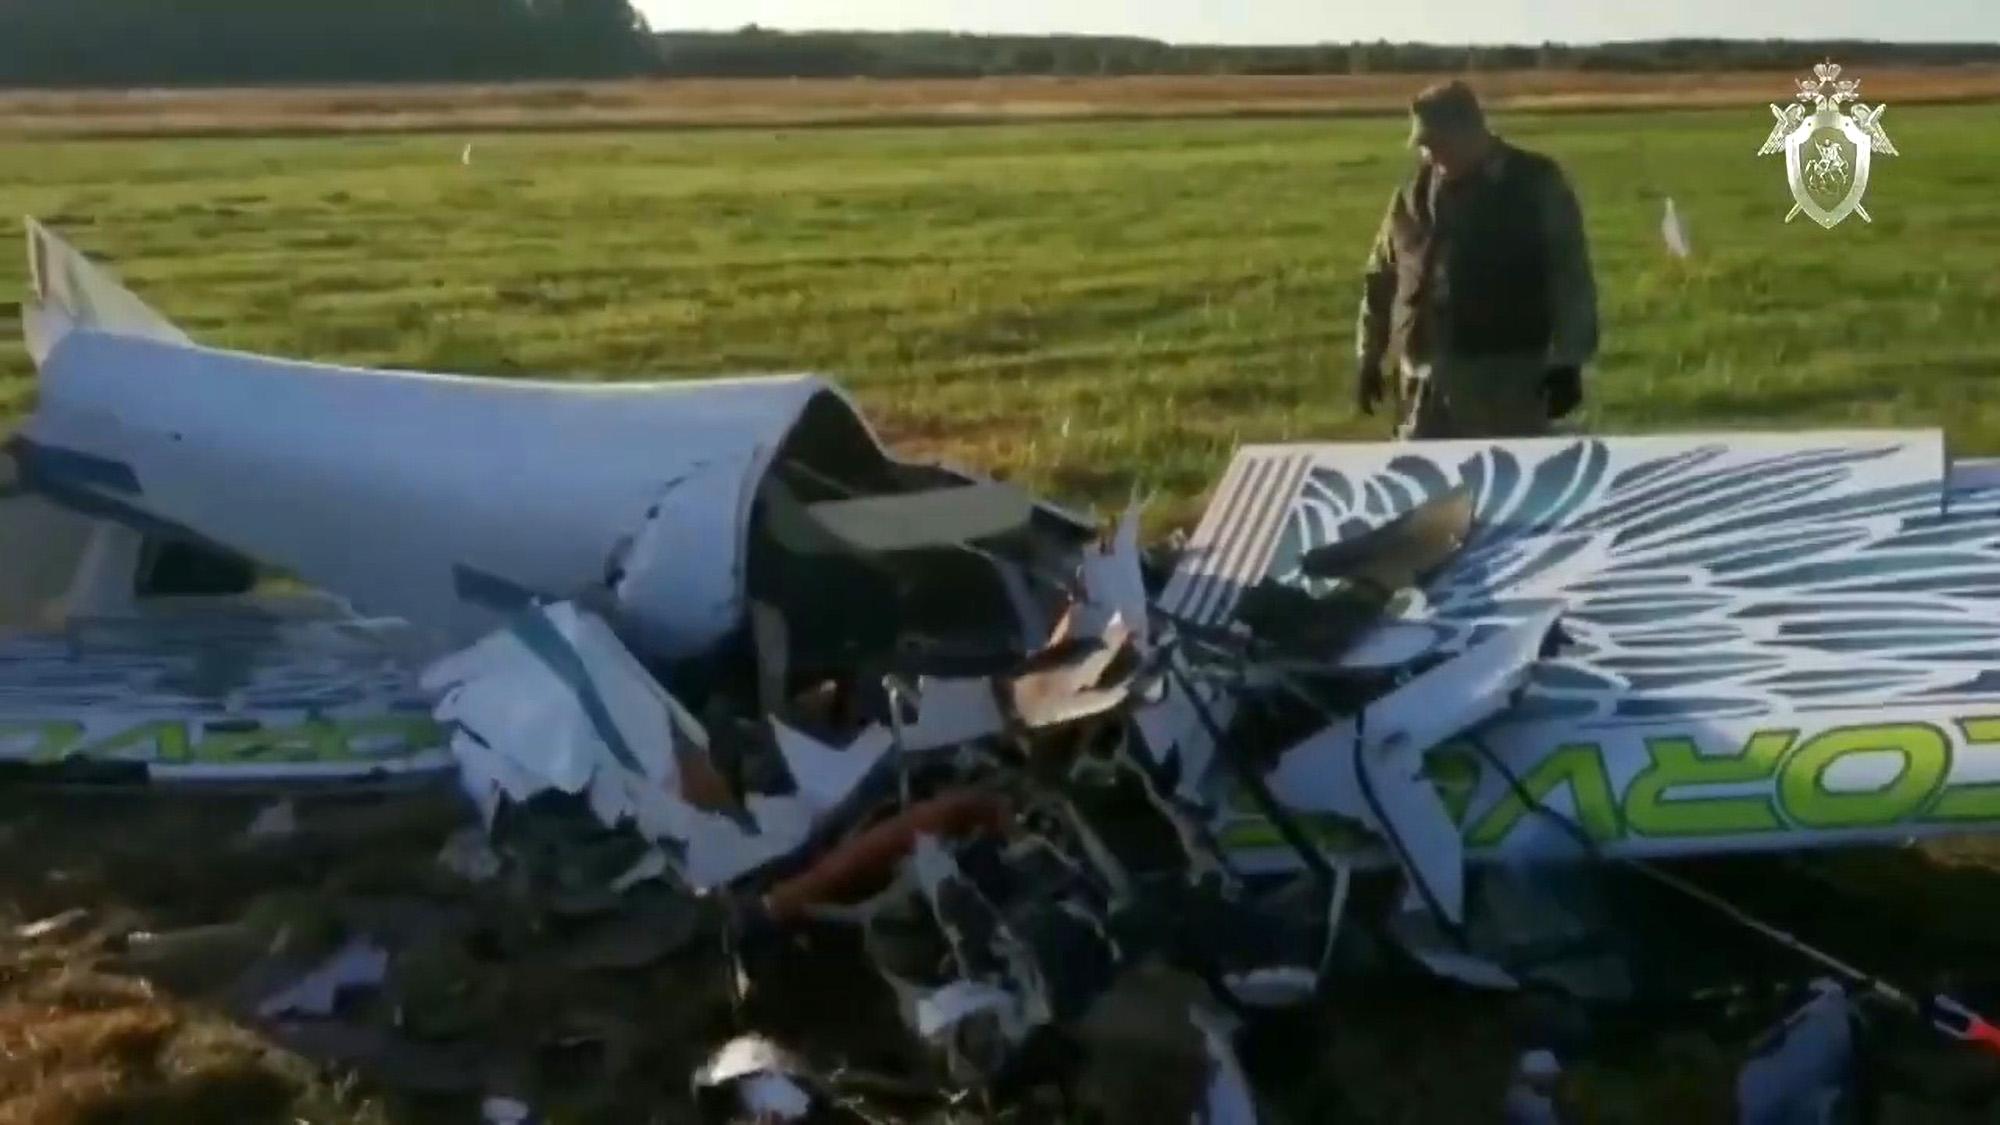 The Fright Stuff:  Pilot Dies in Stunt to Show Off Plane's Aerobatics